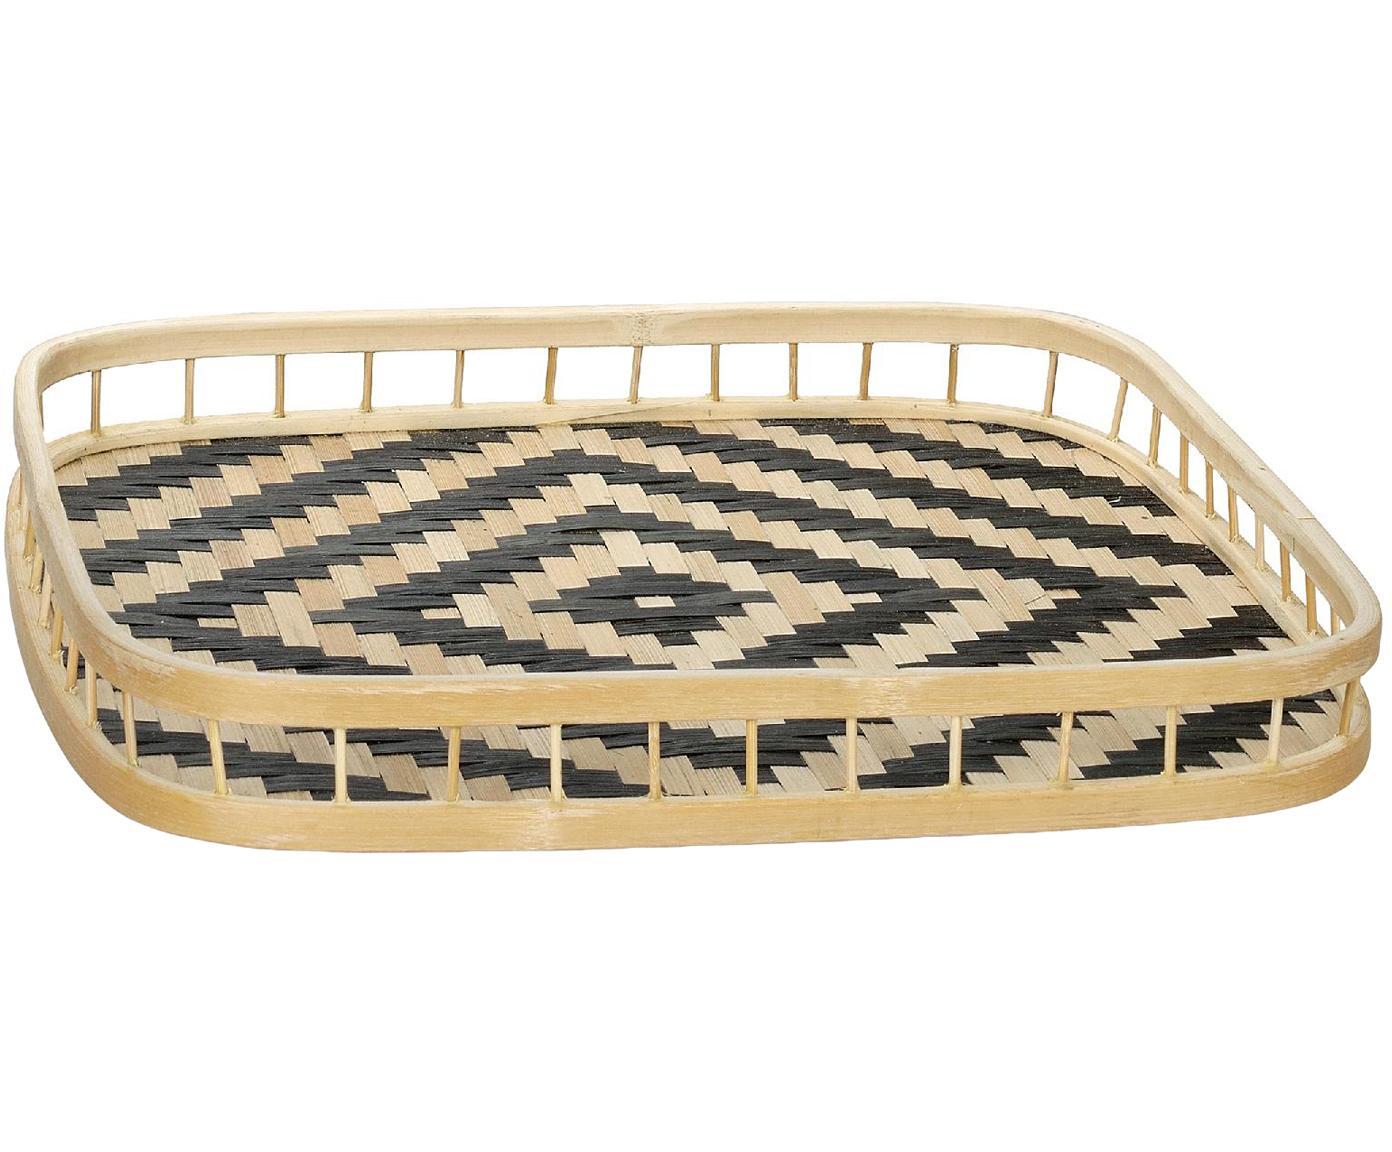 Vassoio decorativo Rhombus, Bambù, Beige, nero, Larg. 32 x Prof. 32 cm